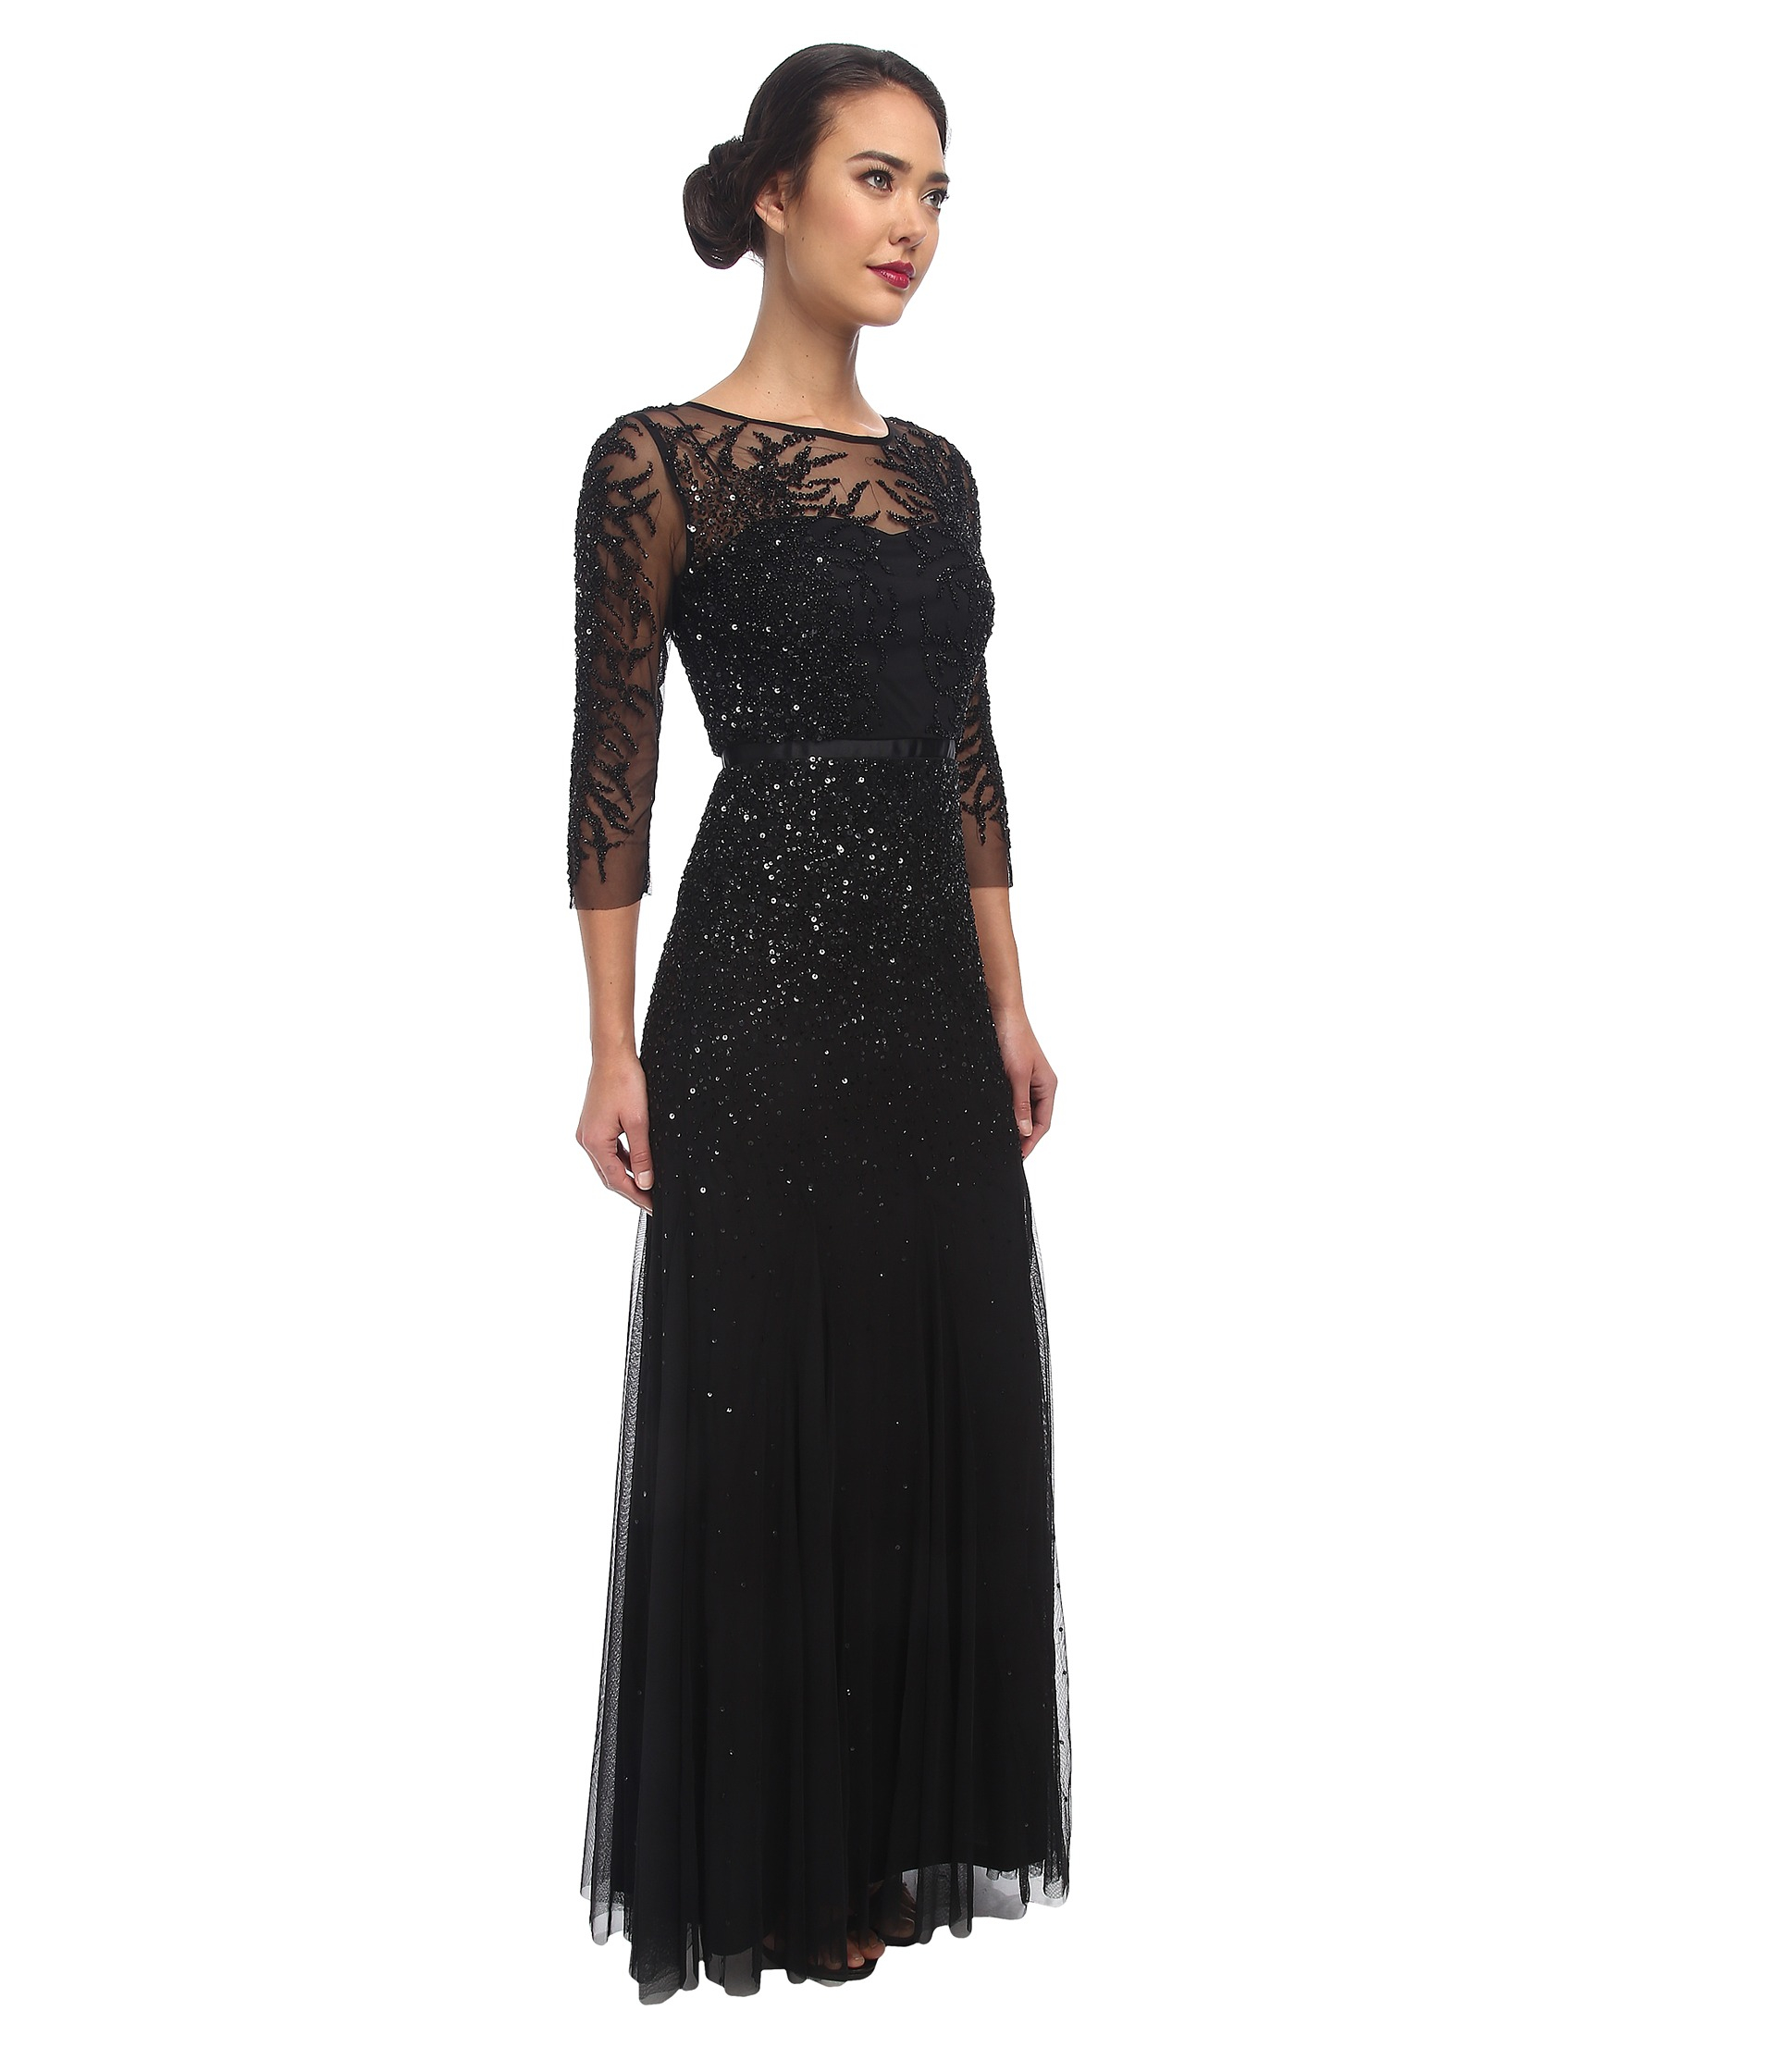 Beaded Chiffon Blouson Gown | Lauren Goss